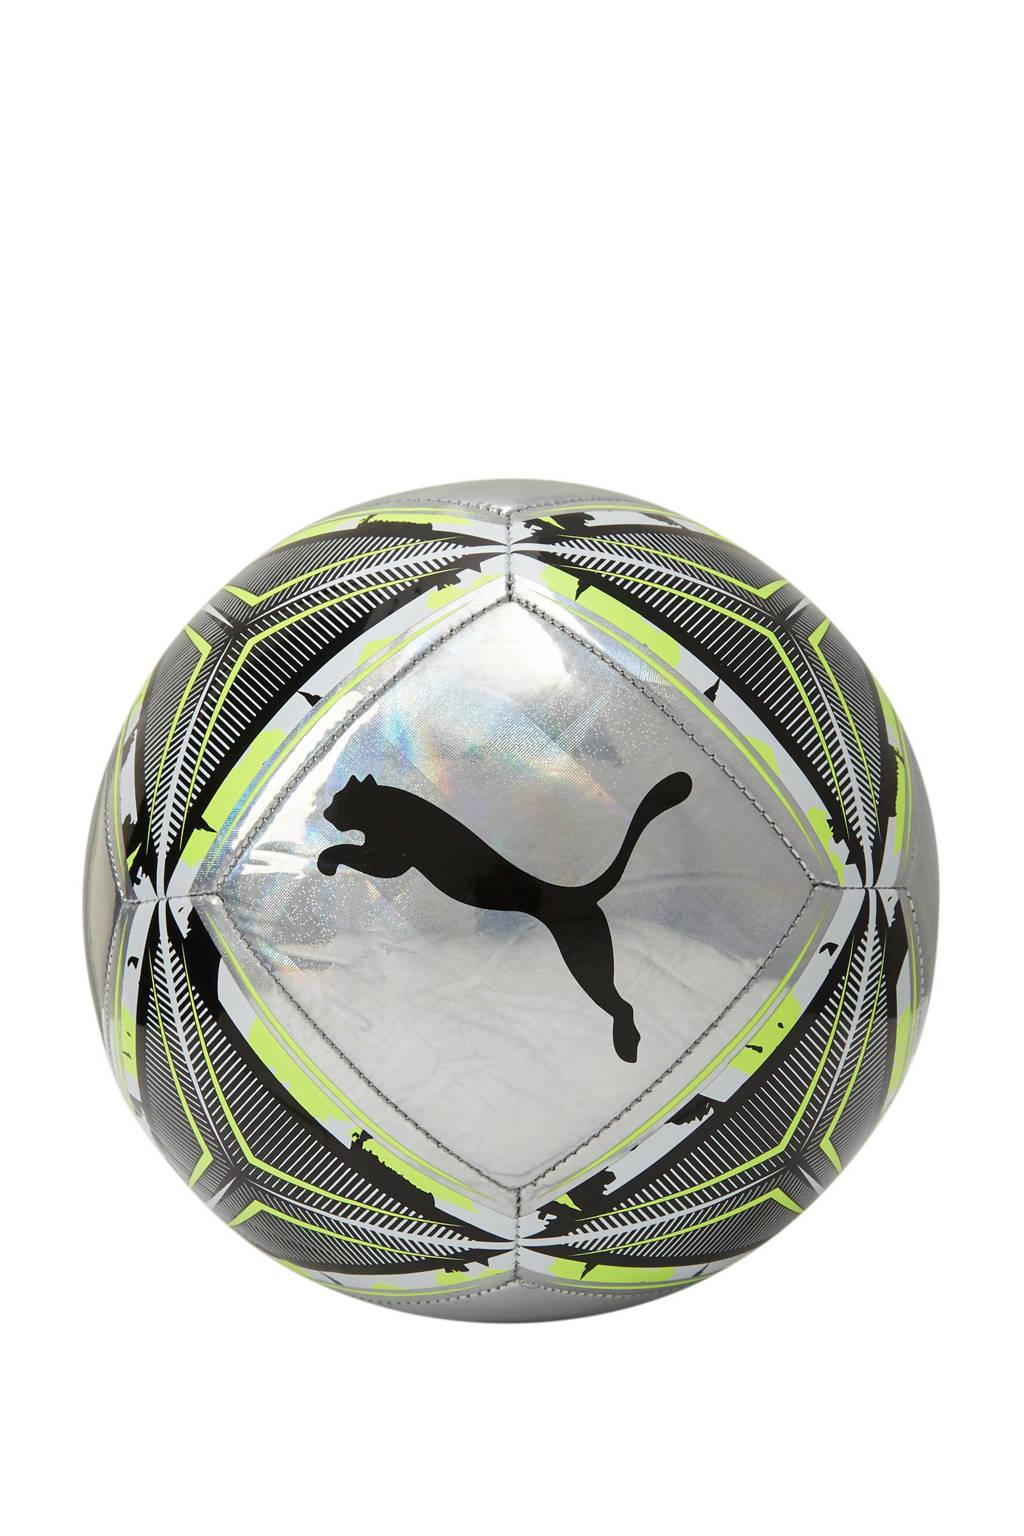 Puma   voetbal zilver/limegroen maat 5, Zilver/limegroen